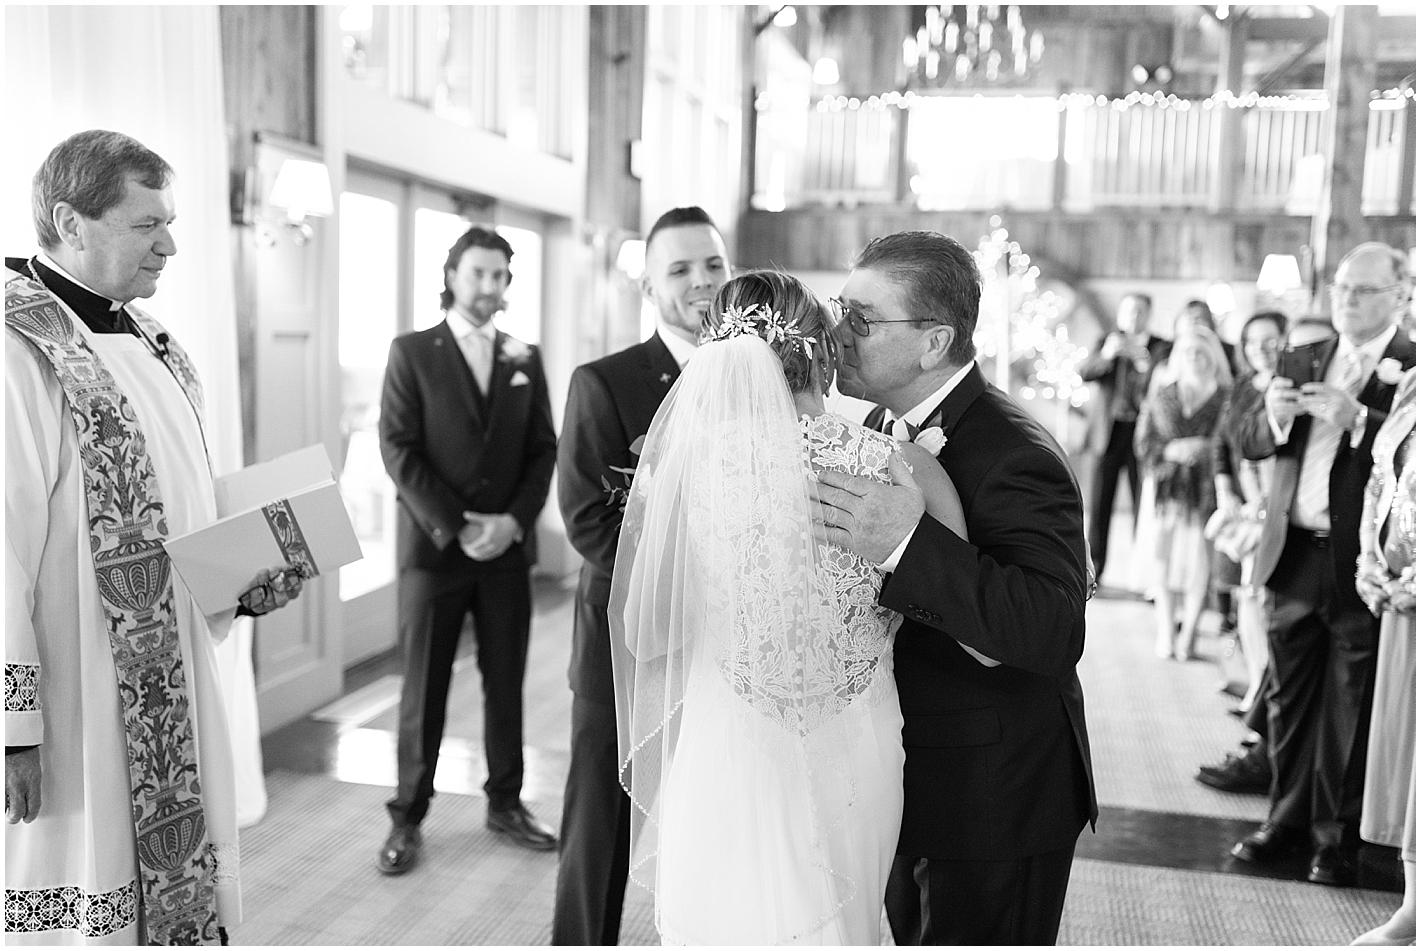 Beautiful Ceremony Groton MA Photos by Alyssa Parker Photography